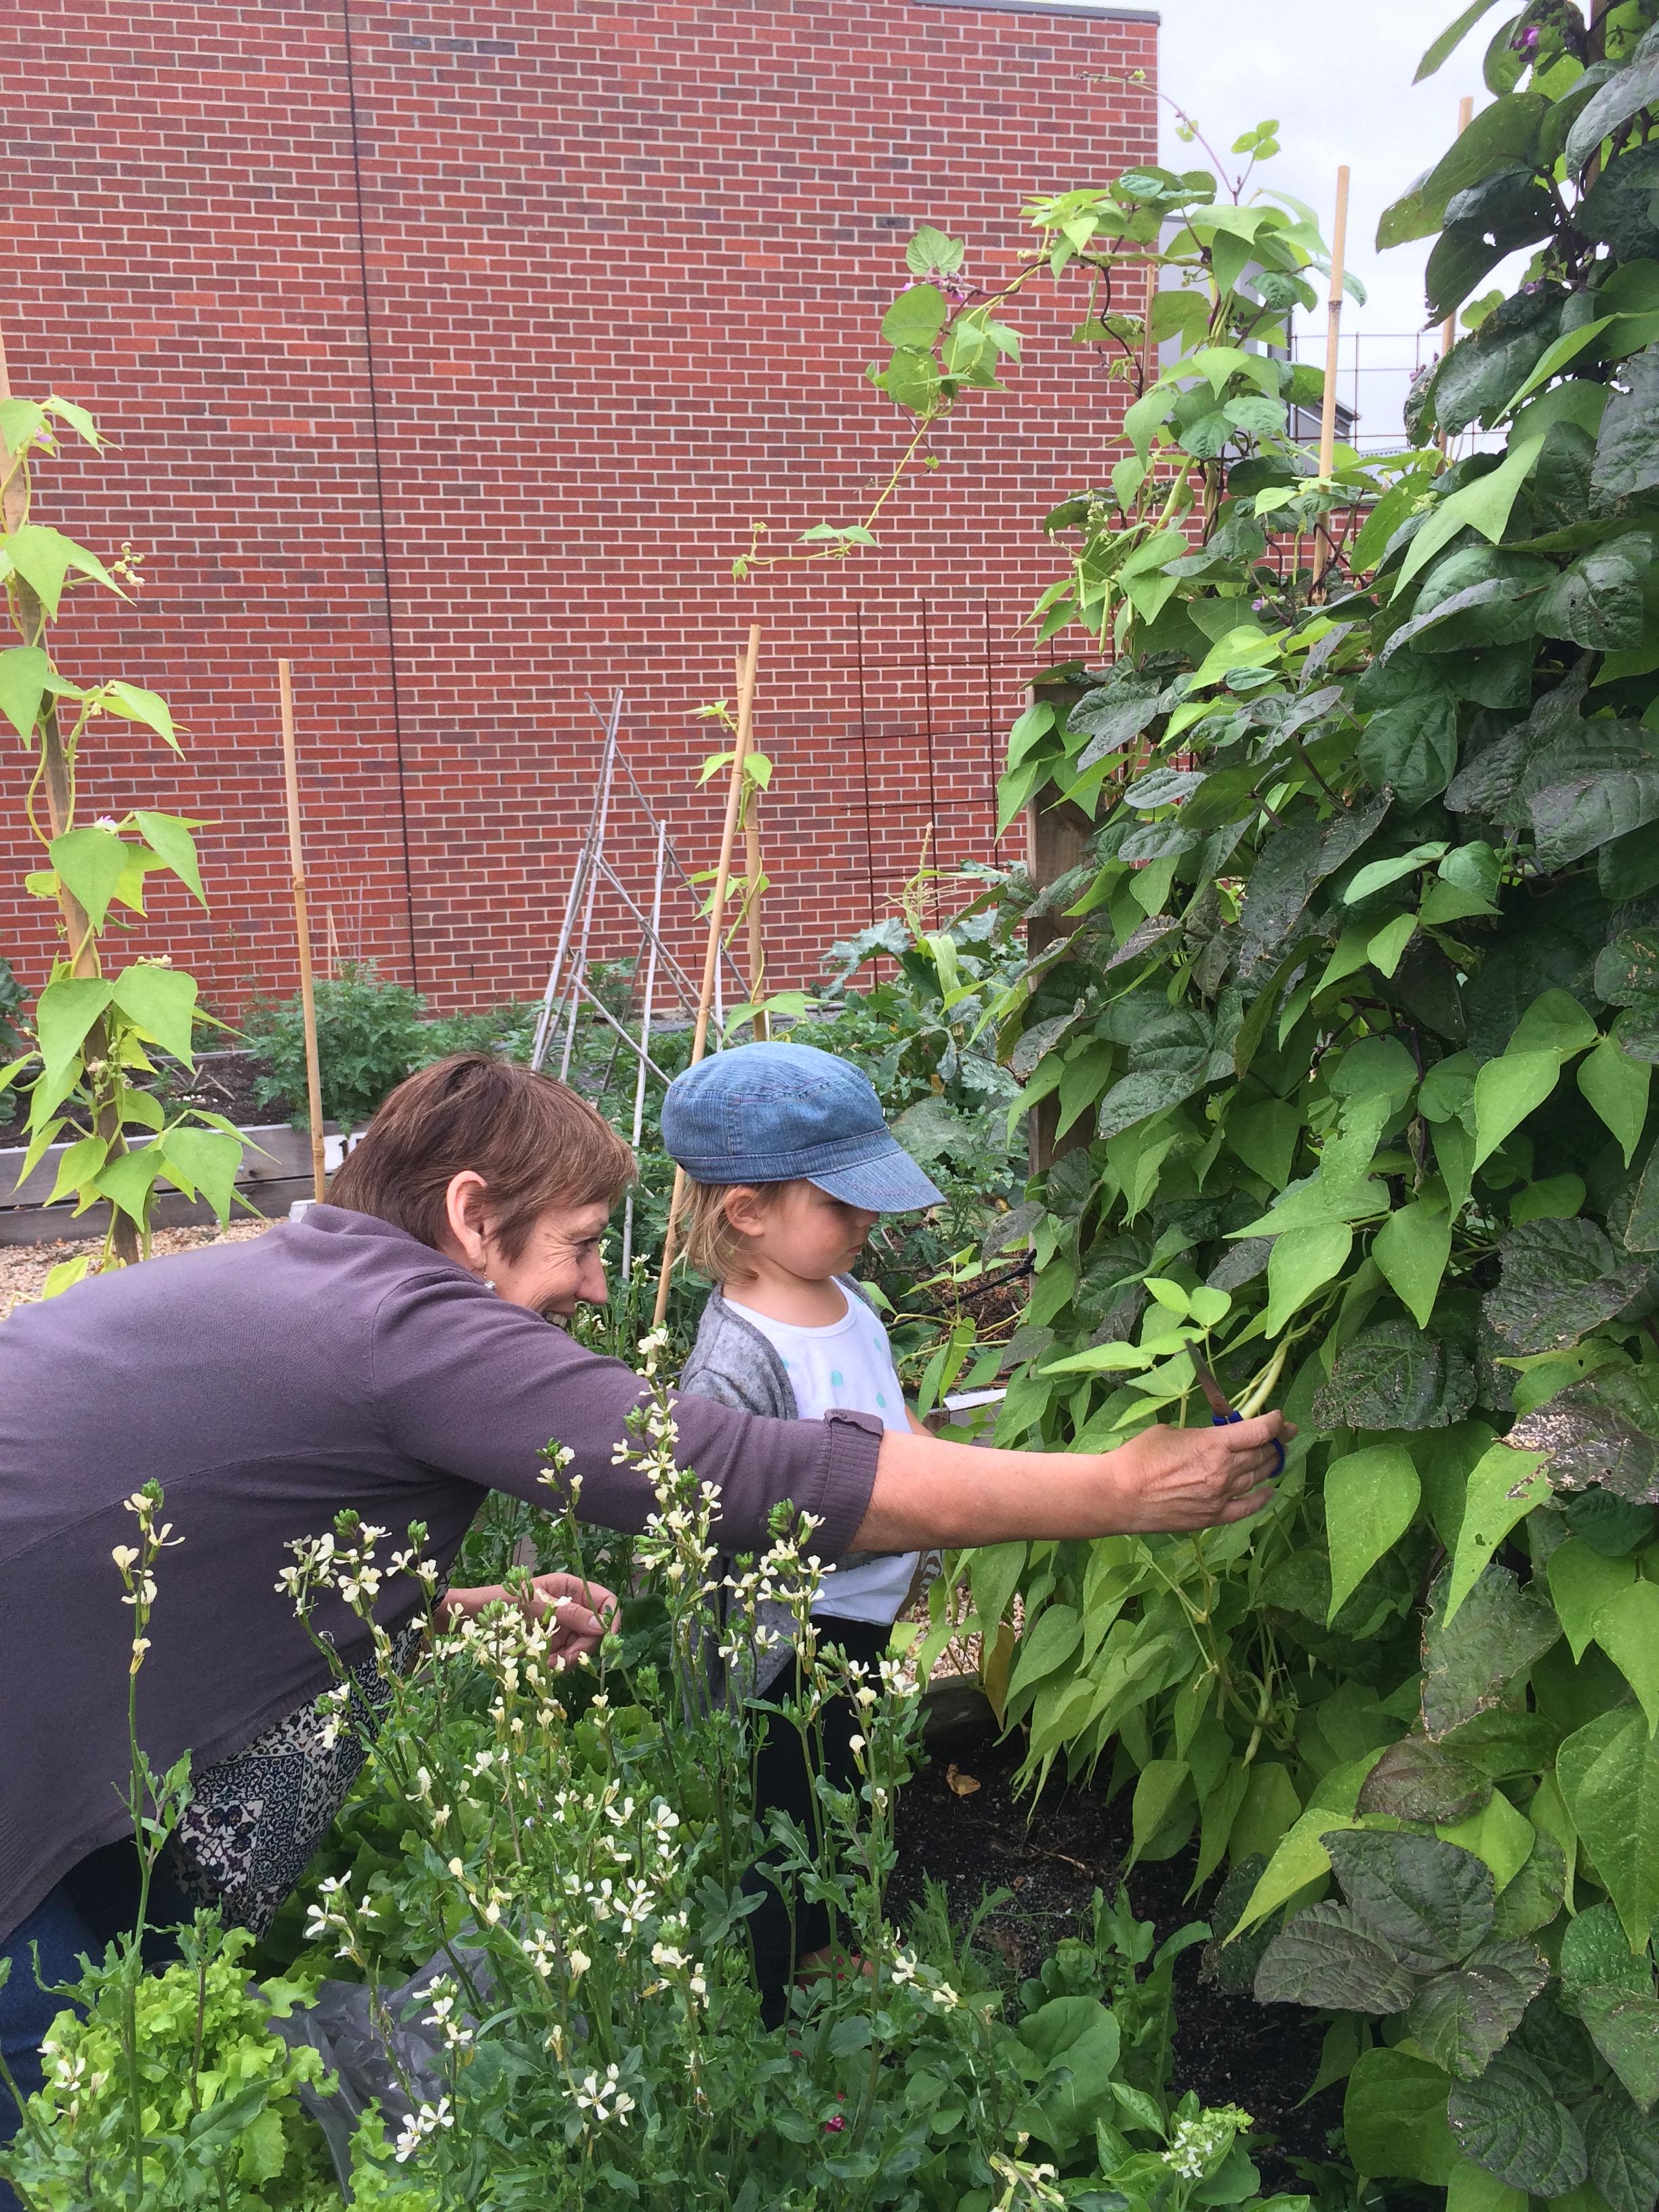 Sue Tale and grand daughter Sunni at Maris's community garden plot